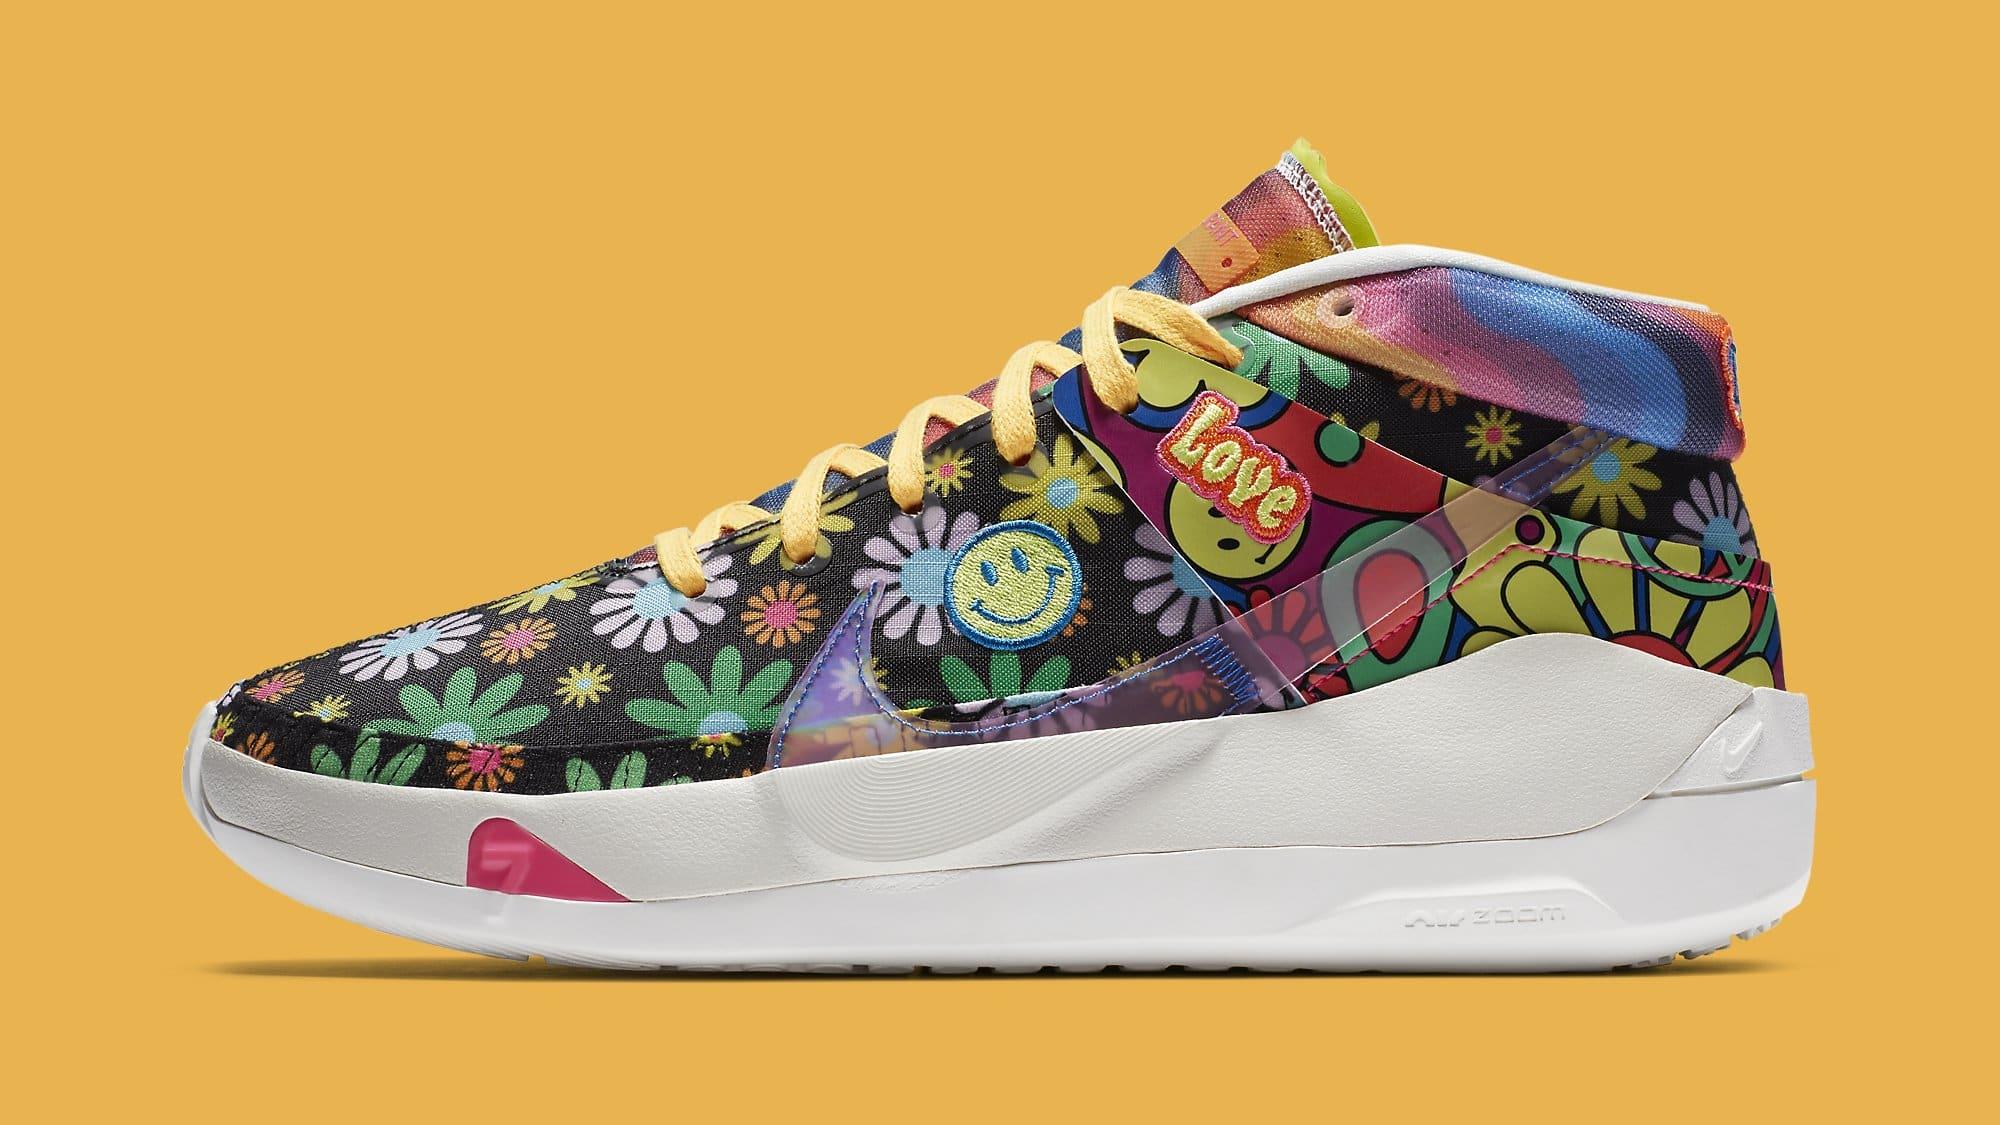 Nike KD 13 'Peace, Love, and Basketball' DA1341-100 Lateral